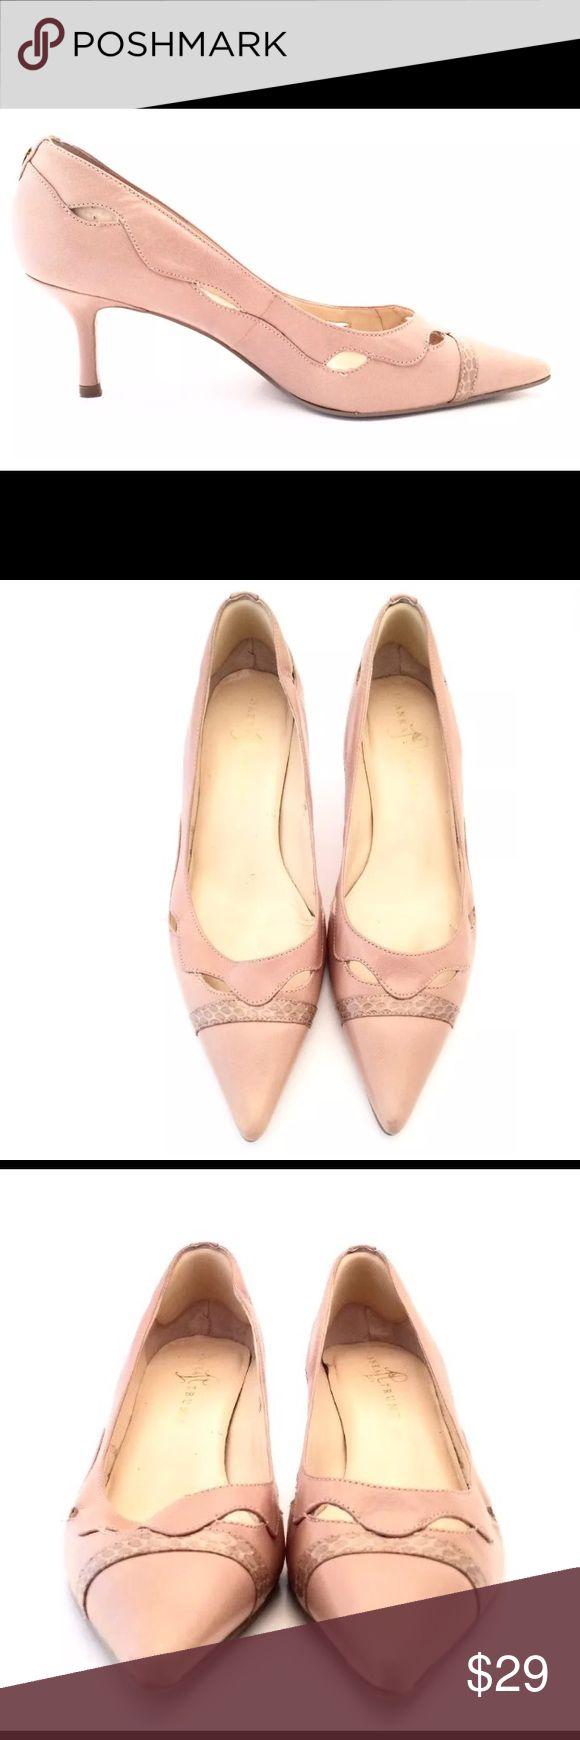 "Spotted while shopping on Poshmark: Ivanka Trump Beige Leather Cut Out ""Imina"" Pumps! #poshmark #fashion #shopping #style #Ivanka Trump #Shoes"